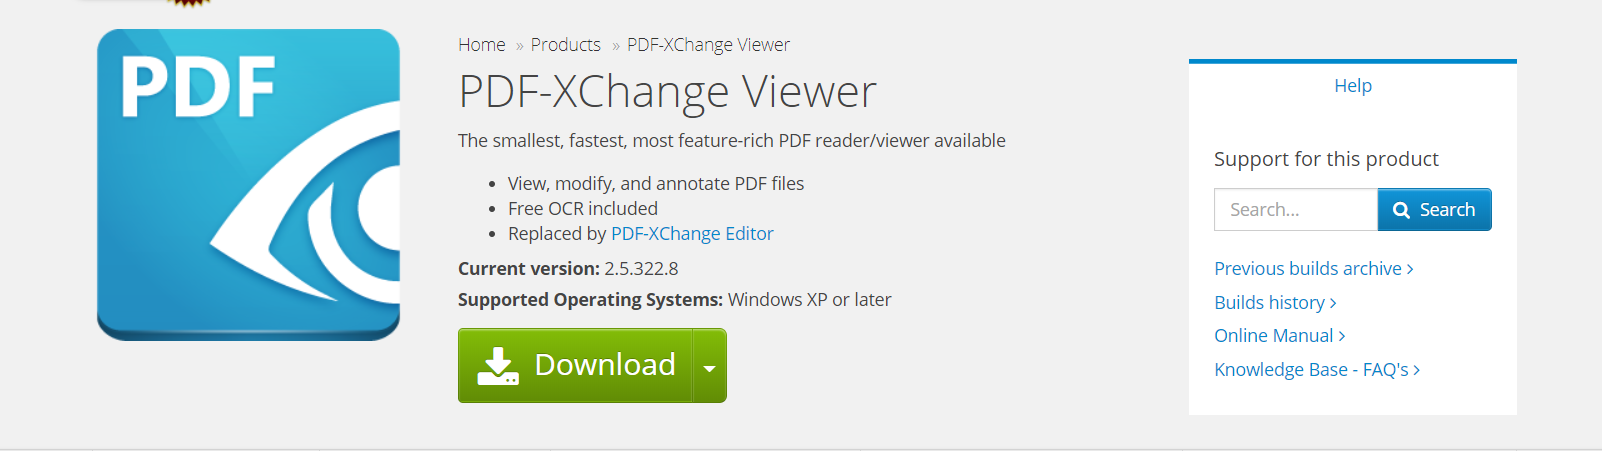 PDF-Xchange Viewer- PDF Reader for Windows OS